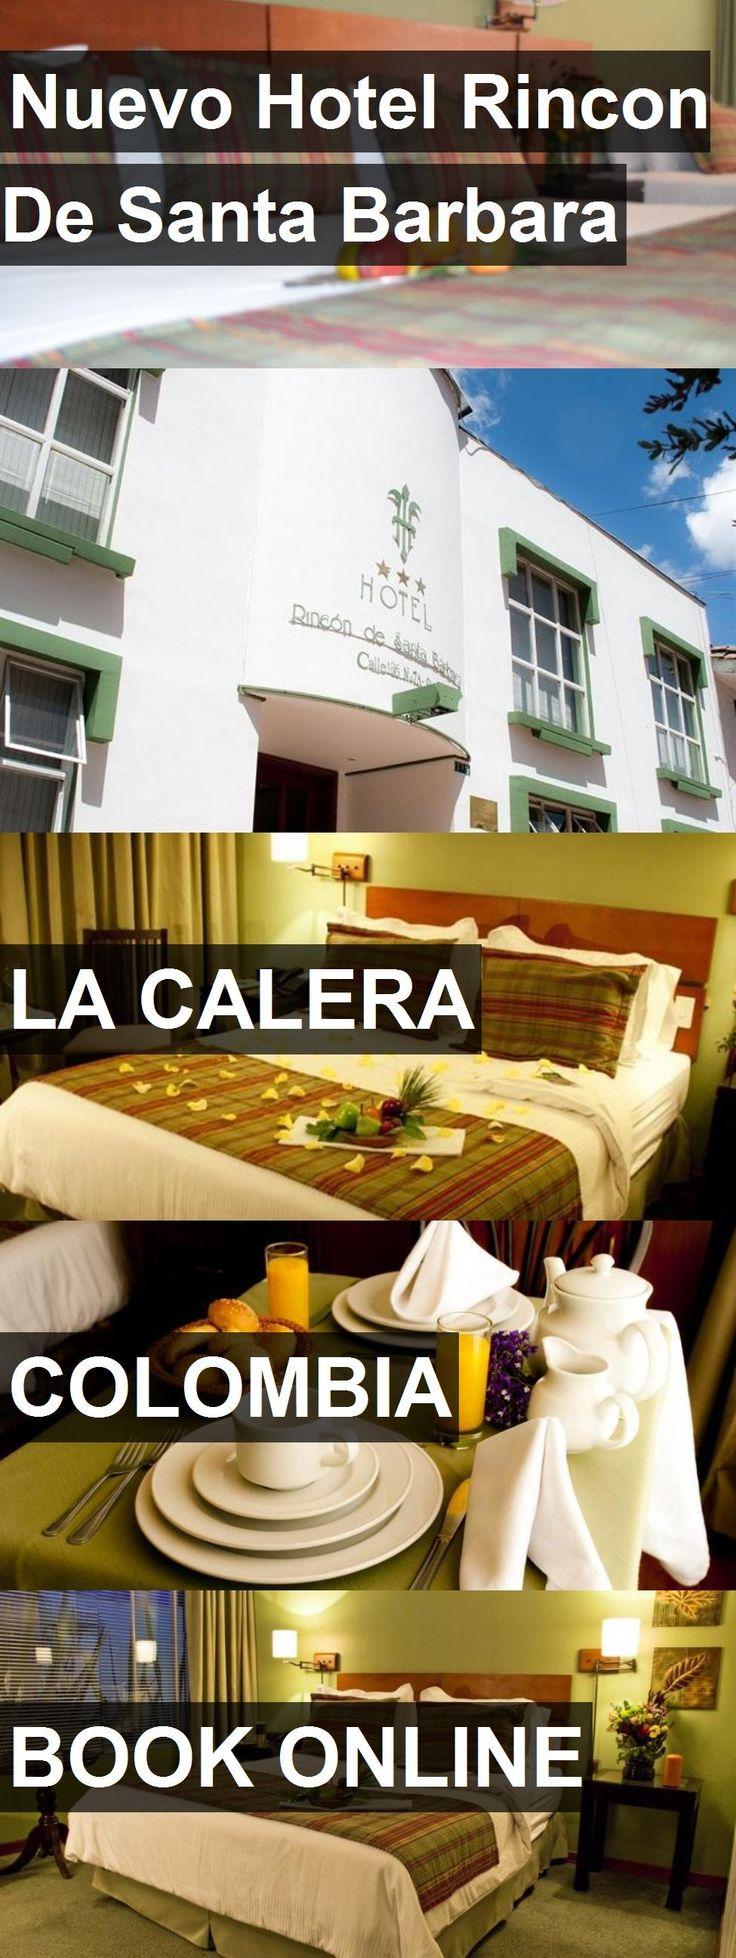 Hotel Nuevo Hotel Rincon De Santa Barbara in La Calera, Colombia. For more information, photos, reviews and best prices please follow the link. #Colombia #LaCalera #NuevoHotelRinconDeSantaBarbara #hotel #travel #vacation